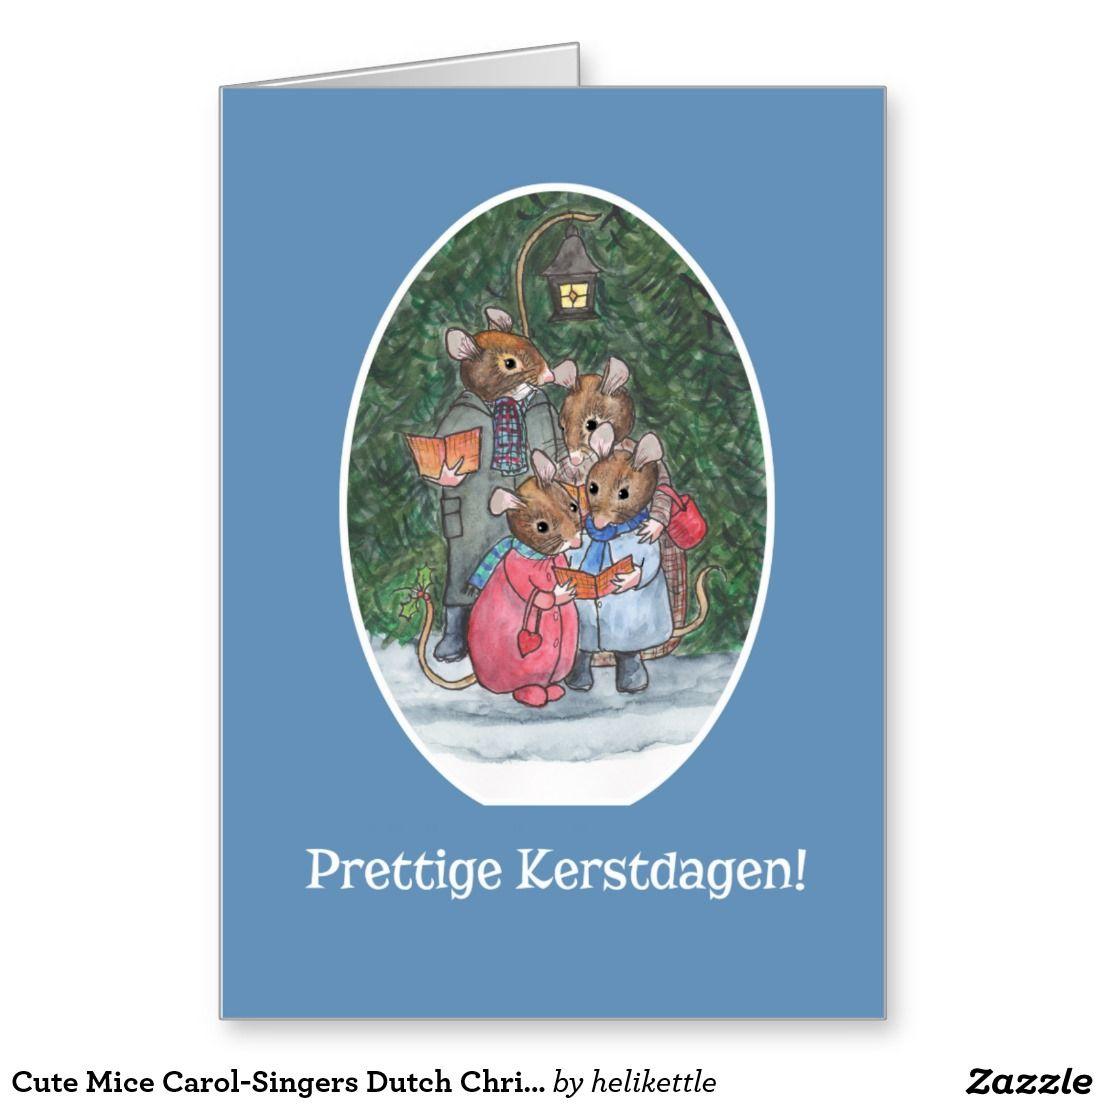 Cute mice carol singers dutch christmas card up to 350 http cute mice carol singers dutch christmas card up to 350 http kristyandbryce Choice Image